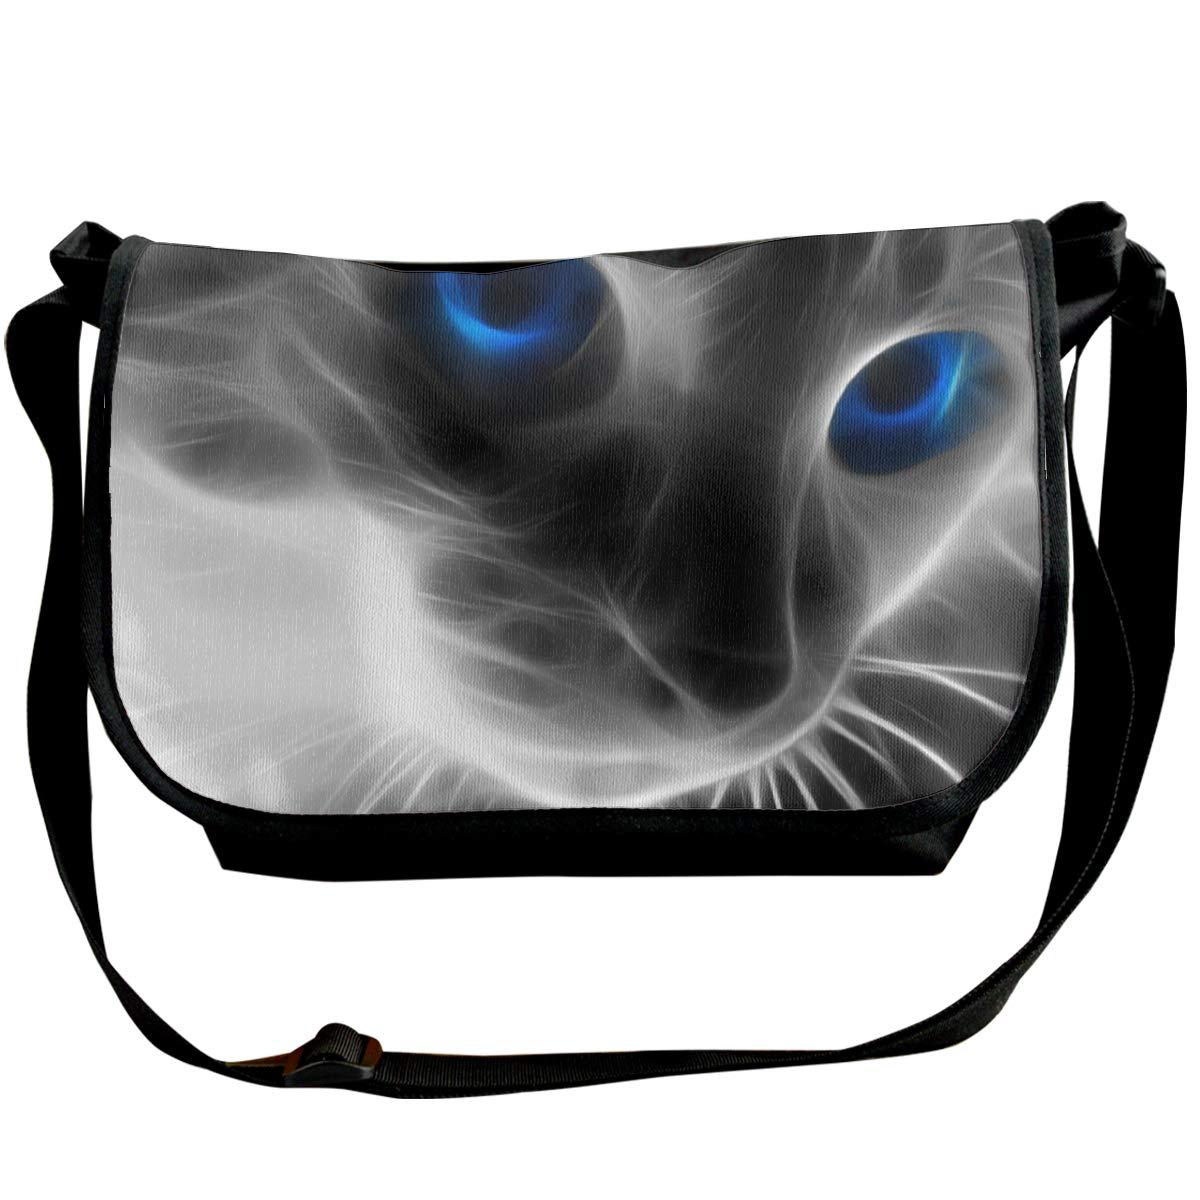 Taslilye Animal Cat Blue Eyes Customized Wide Crossbody Shoulder Bag For Men And Women For Daily Work Or Travel